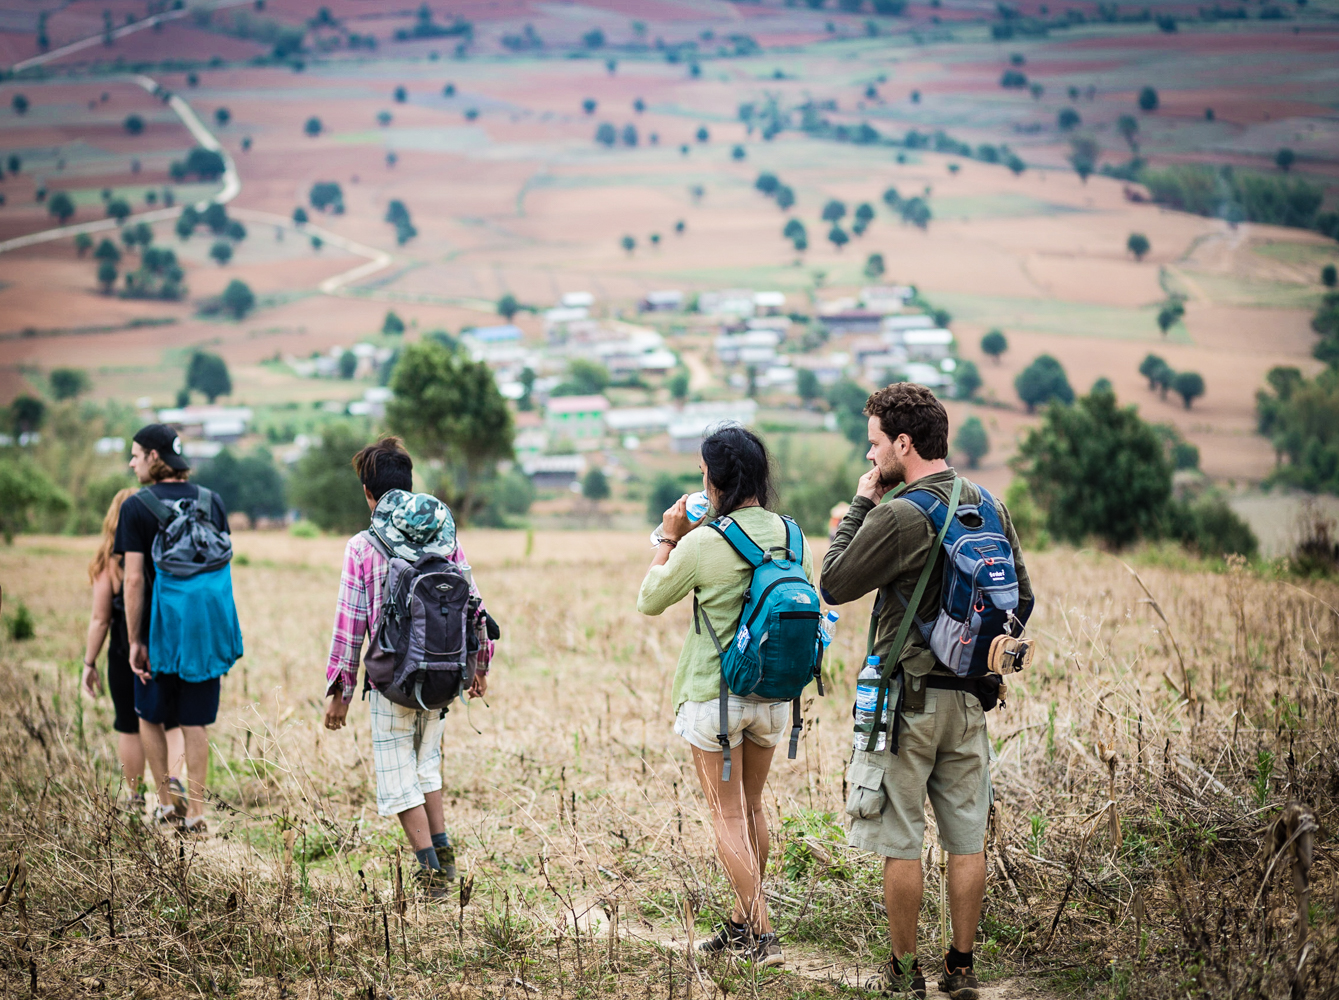 Members of the trekking group.